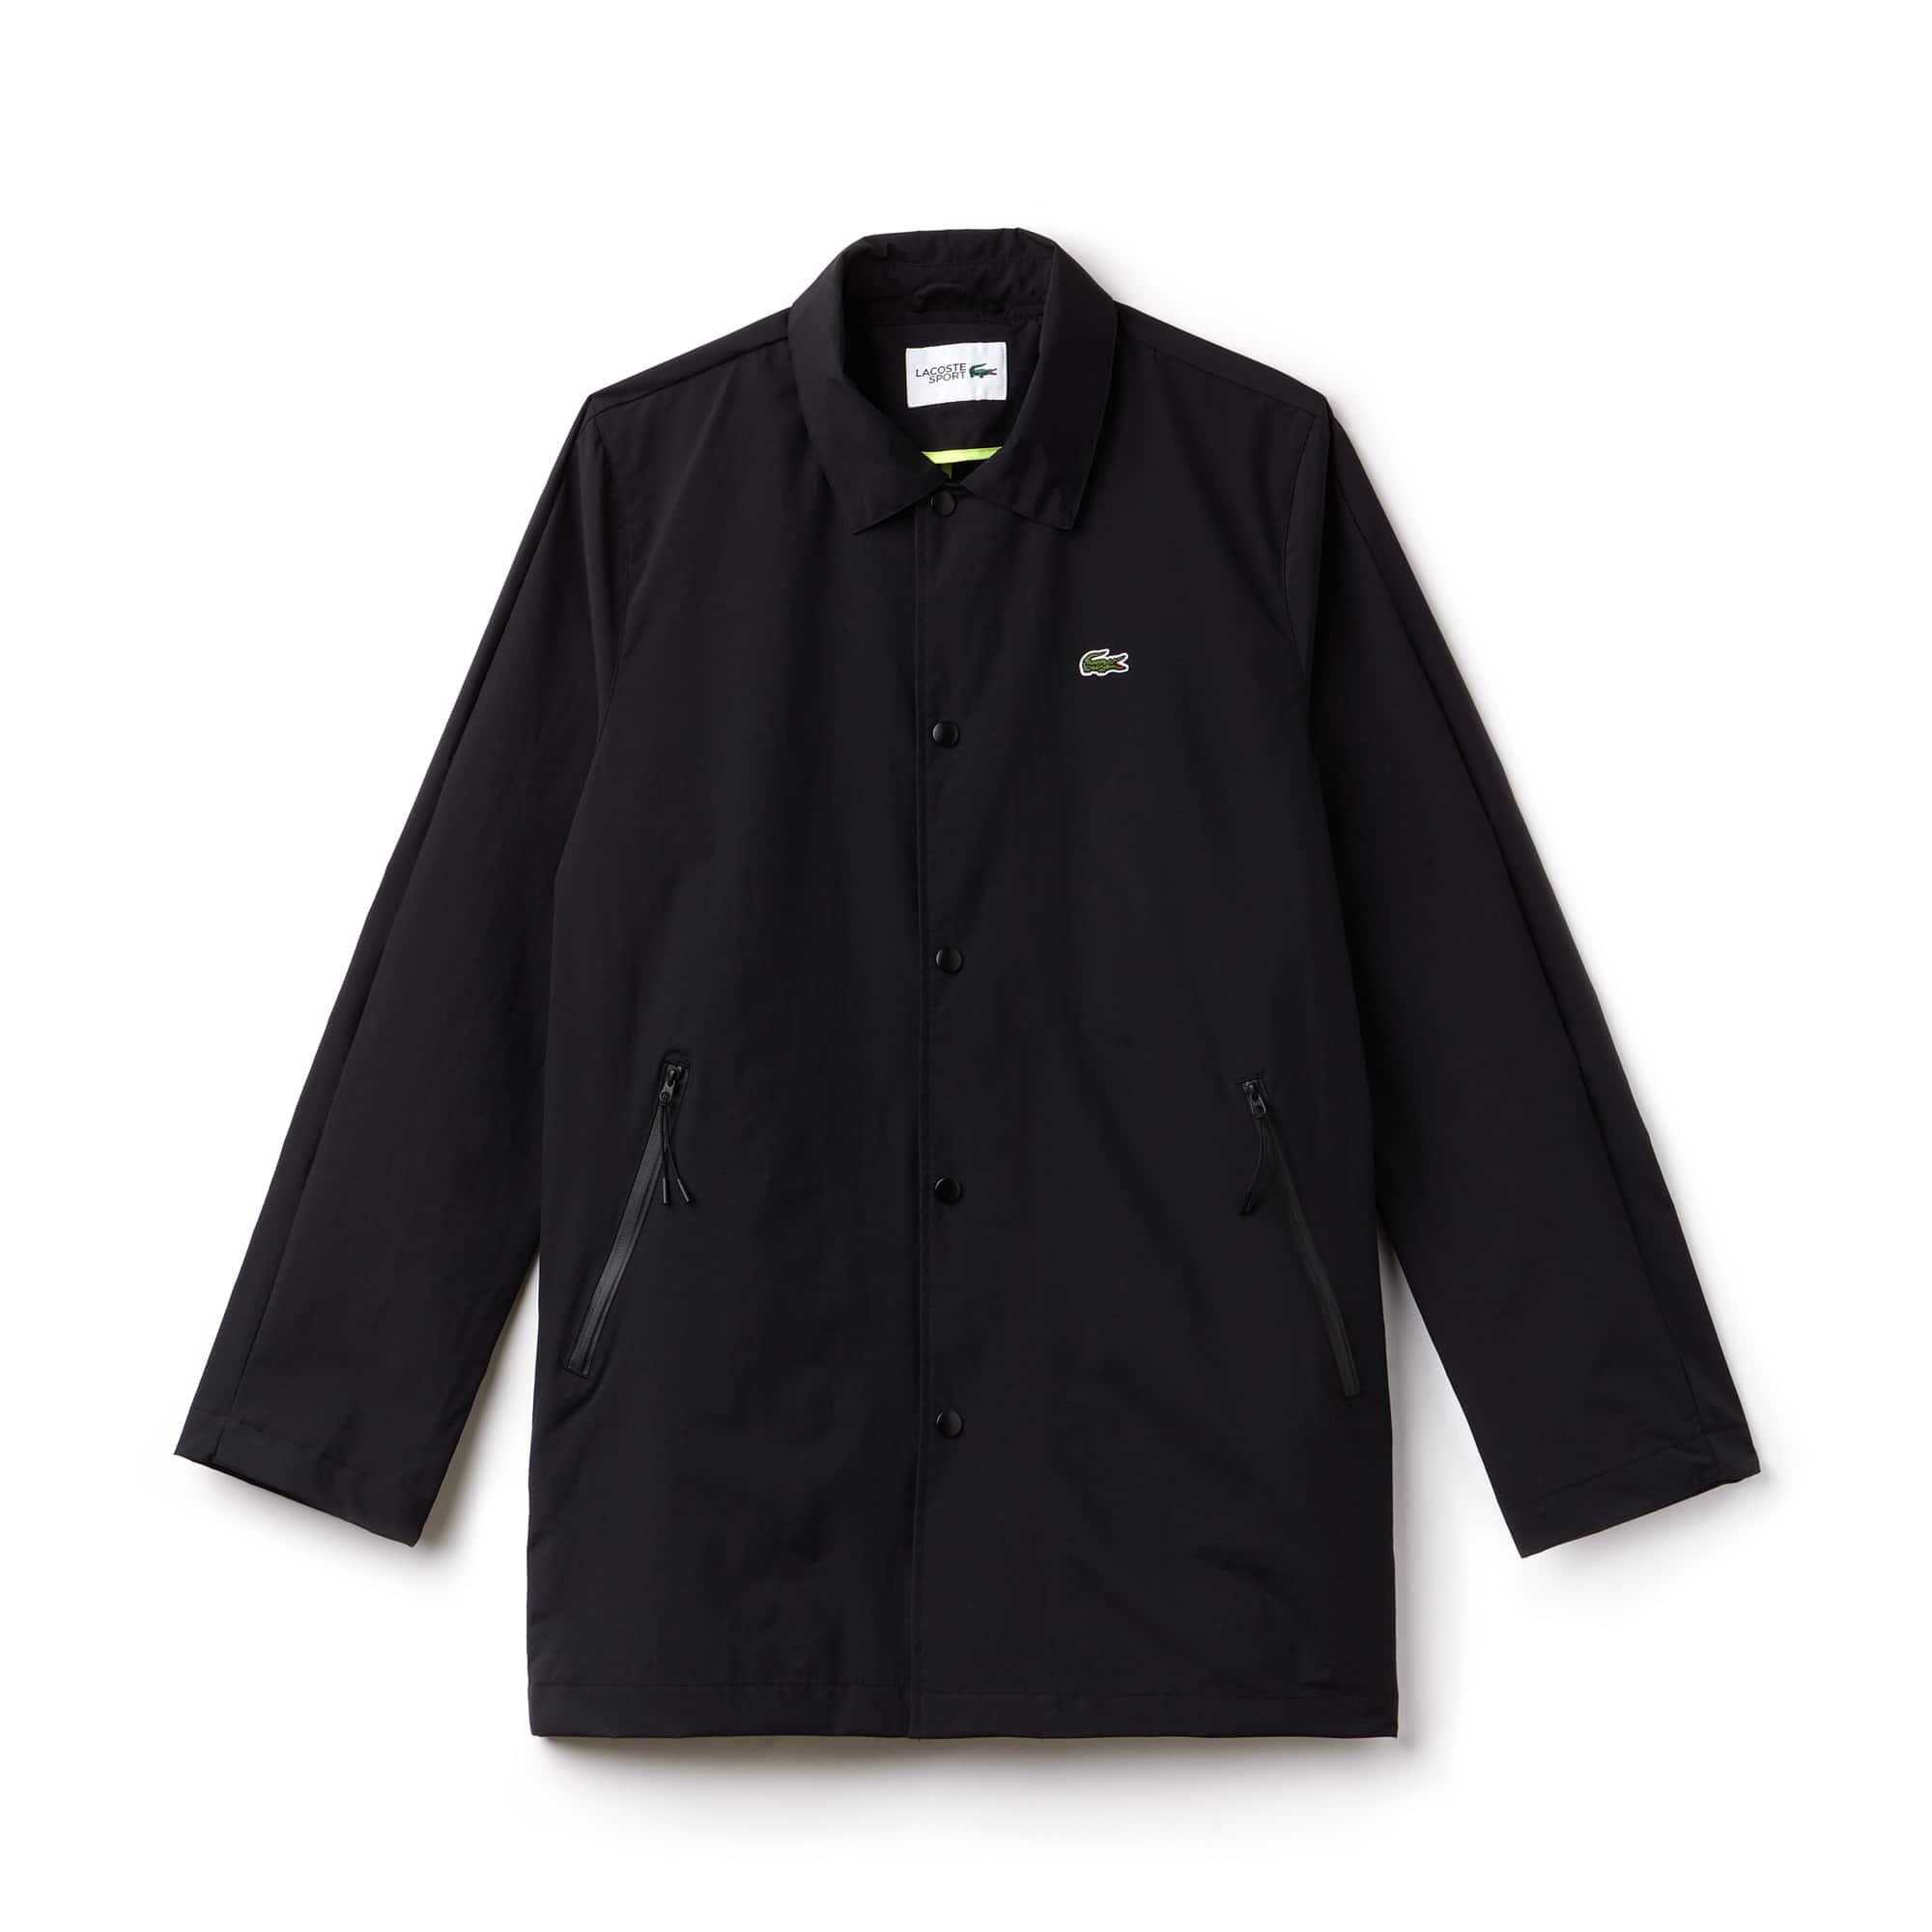 Men's Lacoste SPORT Coated Twill Raincoat